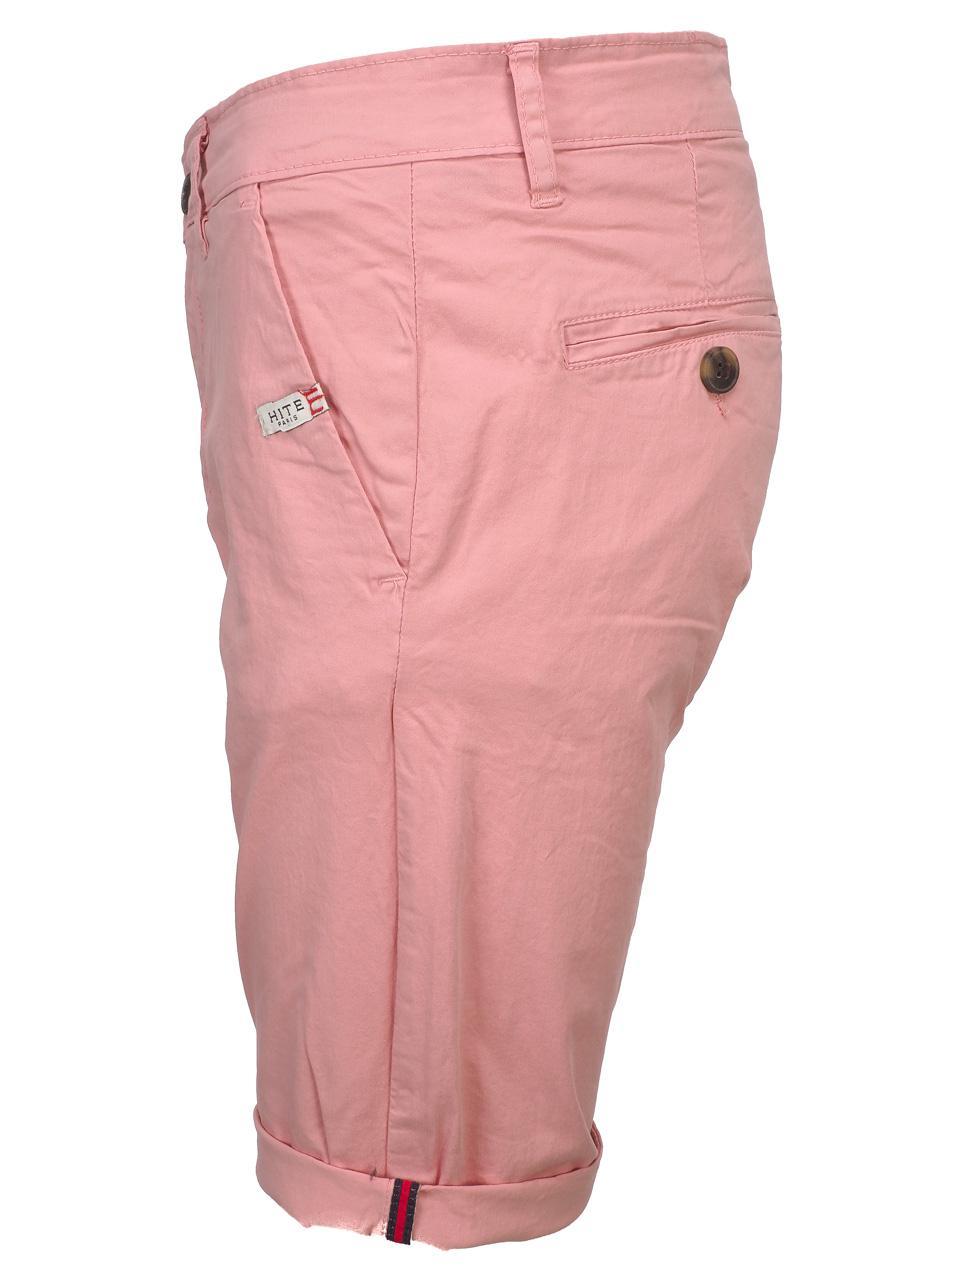 Bermuda-Shorts-Hite-Couture-Vobier-Rse-Bermuda-Chino-Pink-11606-New thumbnail 2